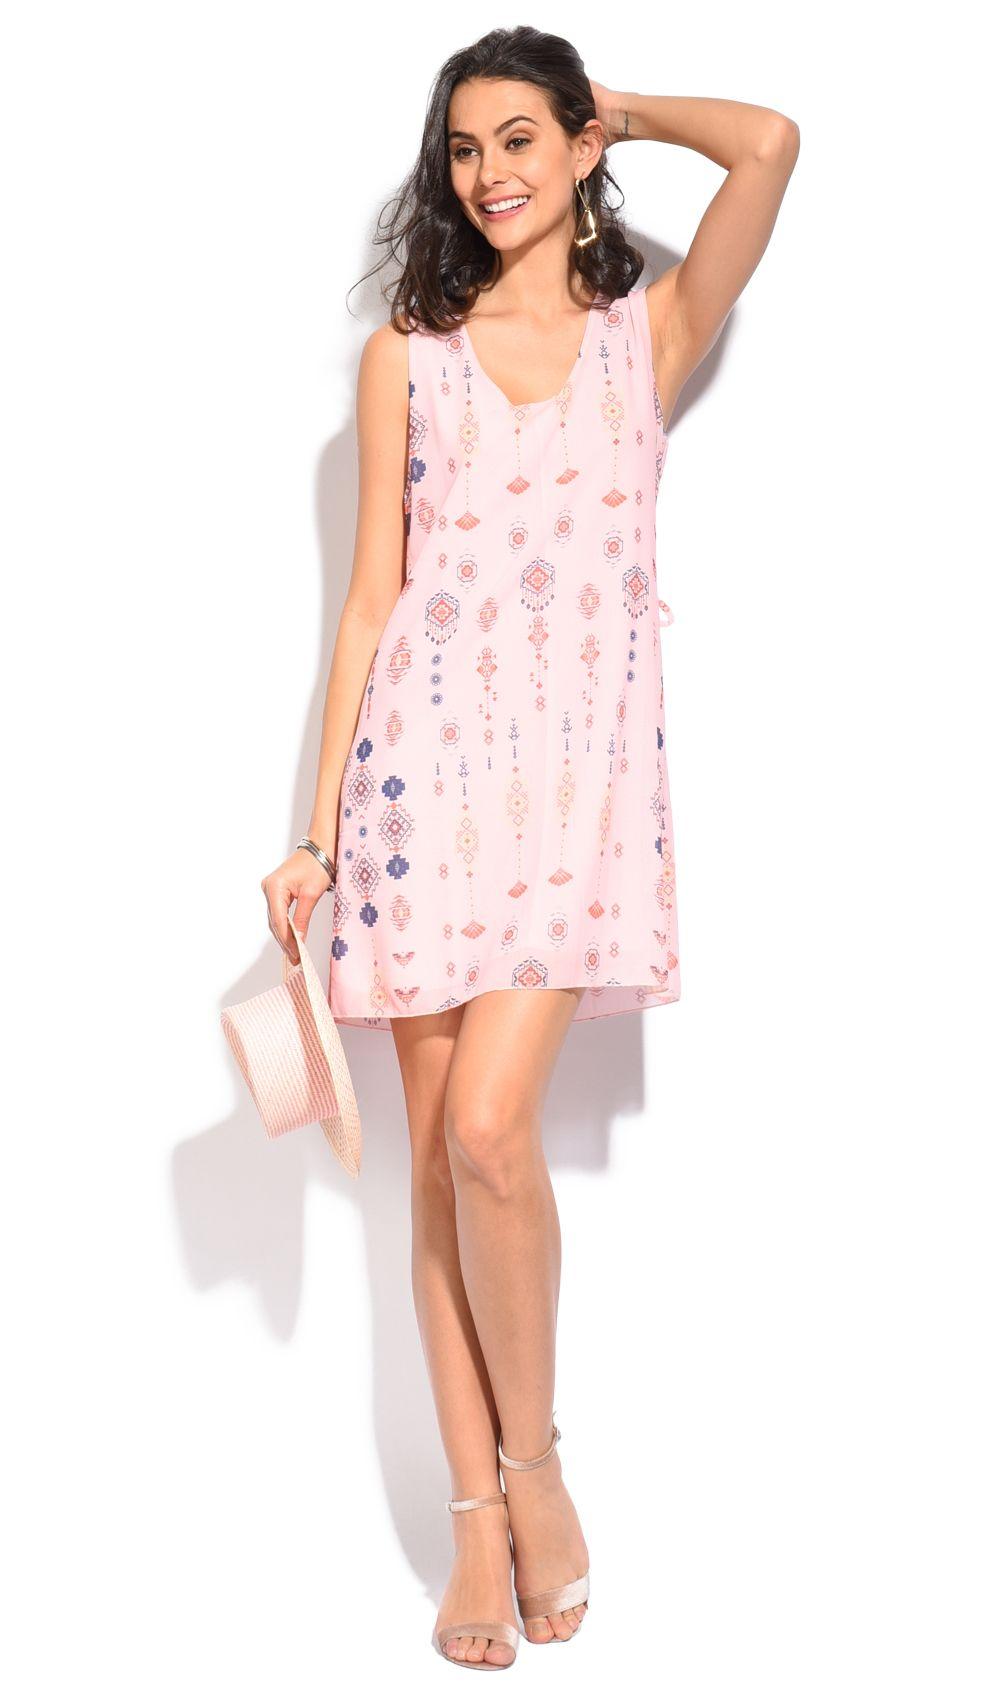 Floral printed pattern crepe Dress